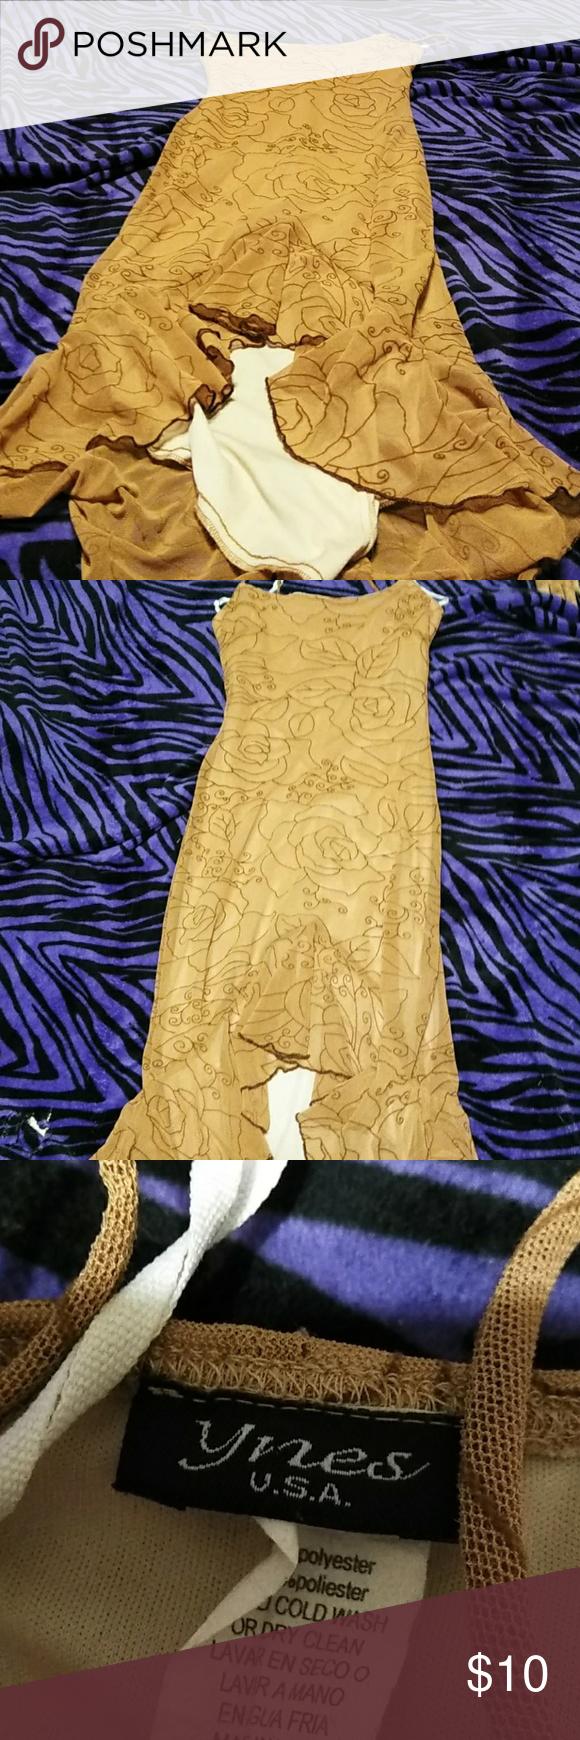 Tan rose dress | My Posh Picks | Pinterest | Rose dress, Rose and Gowns